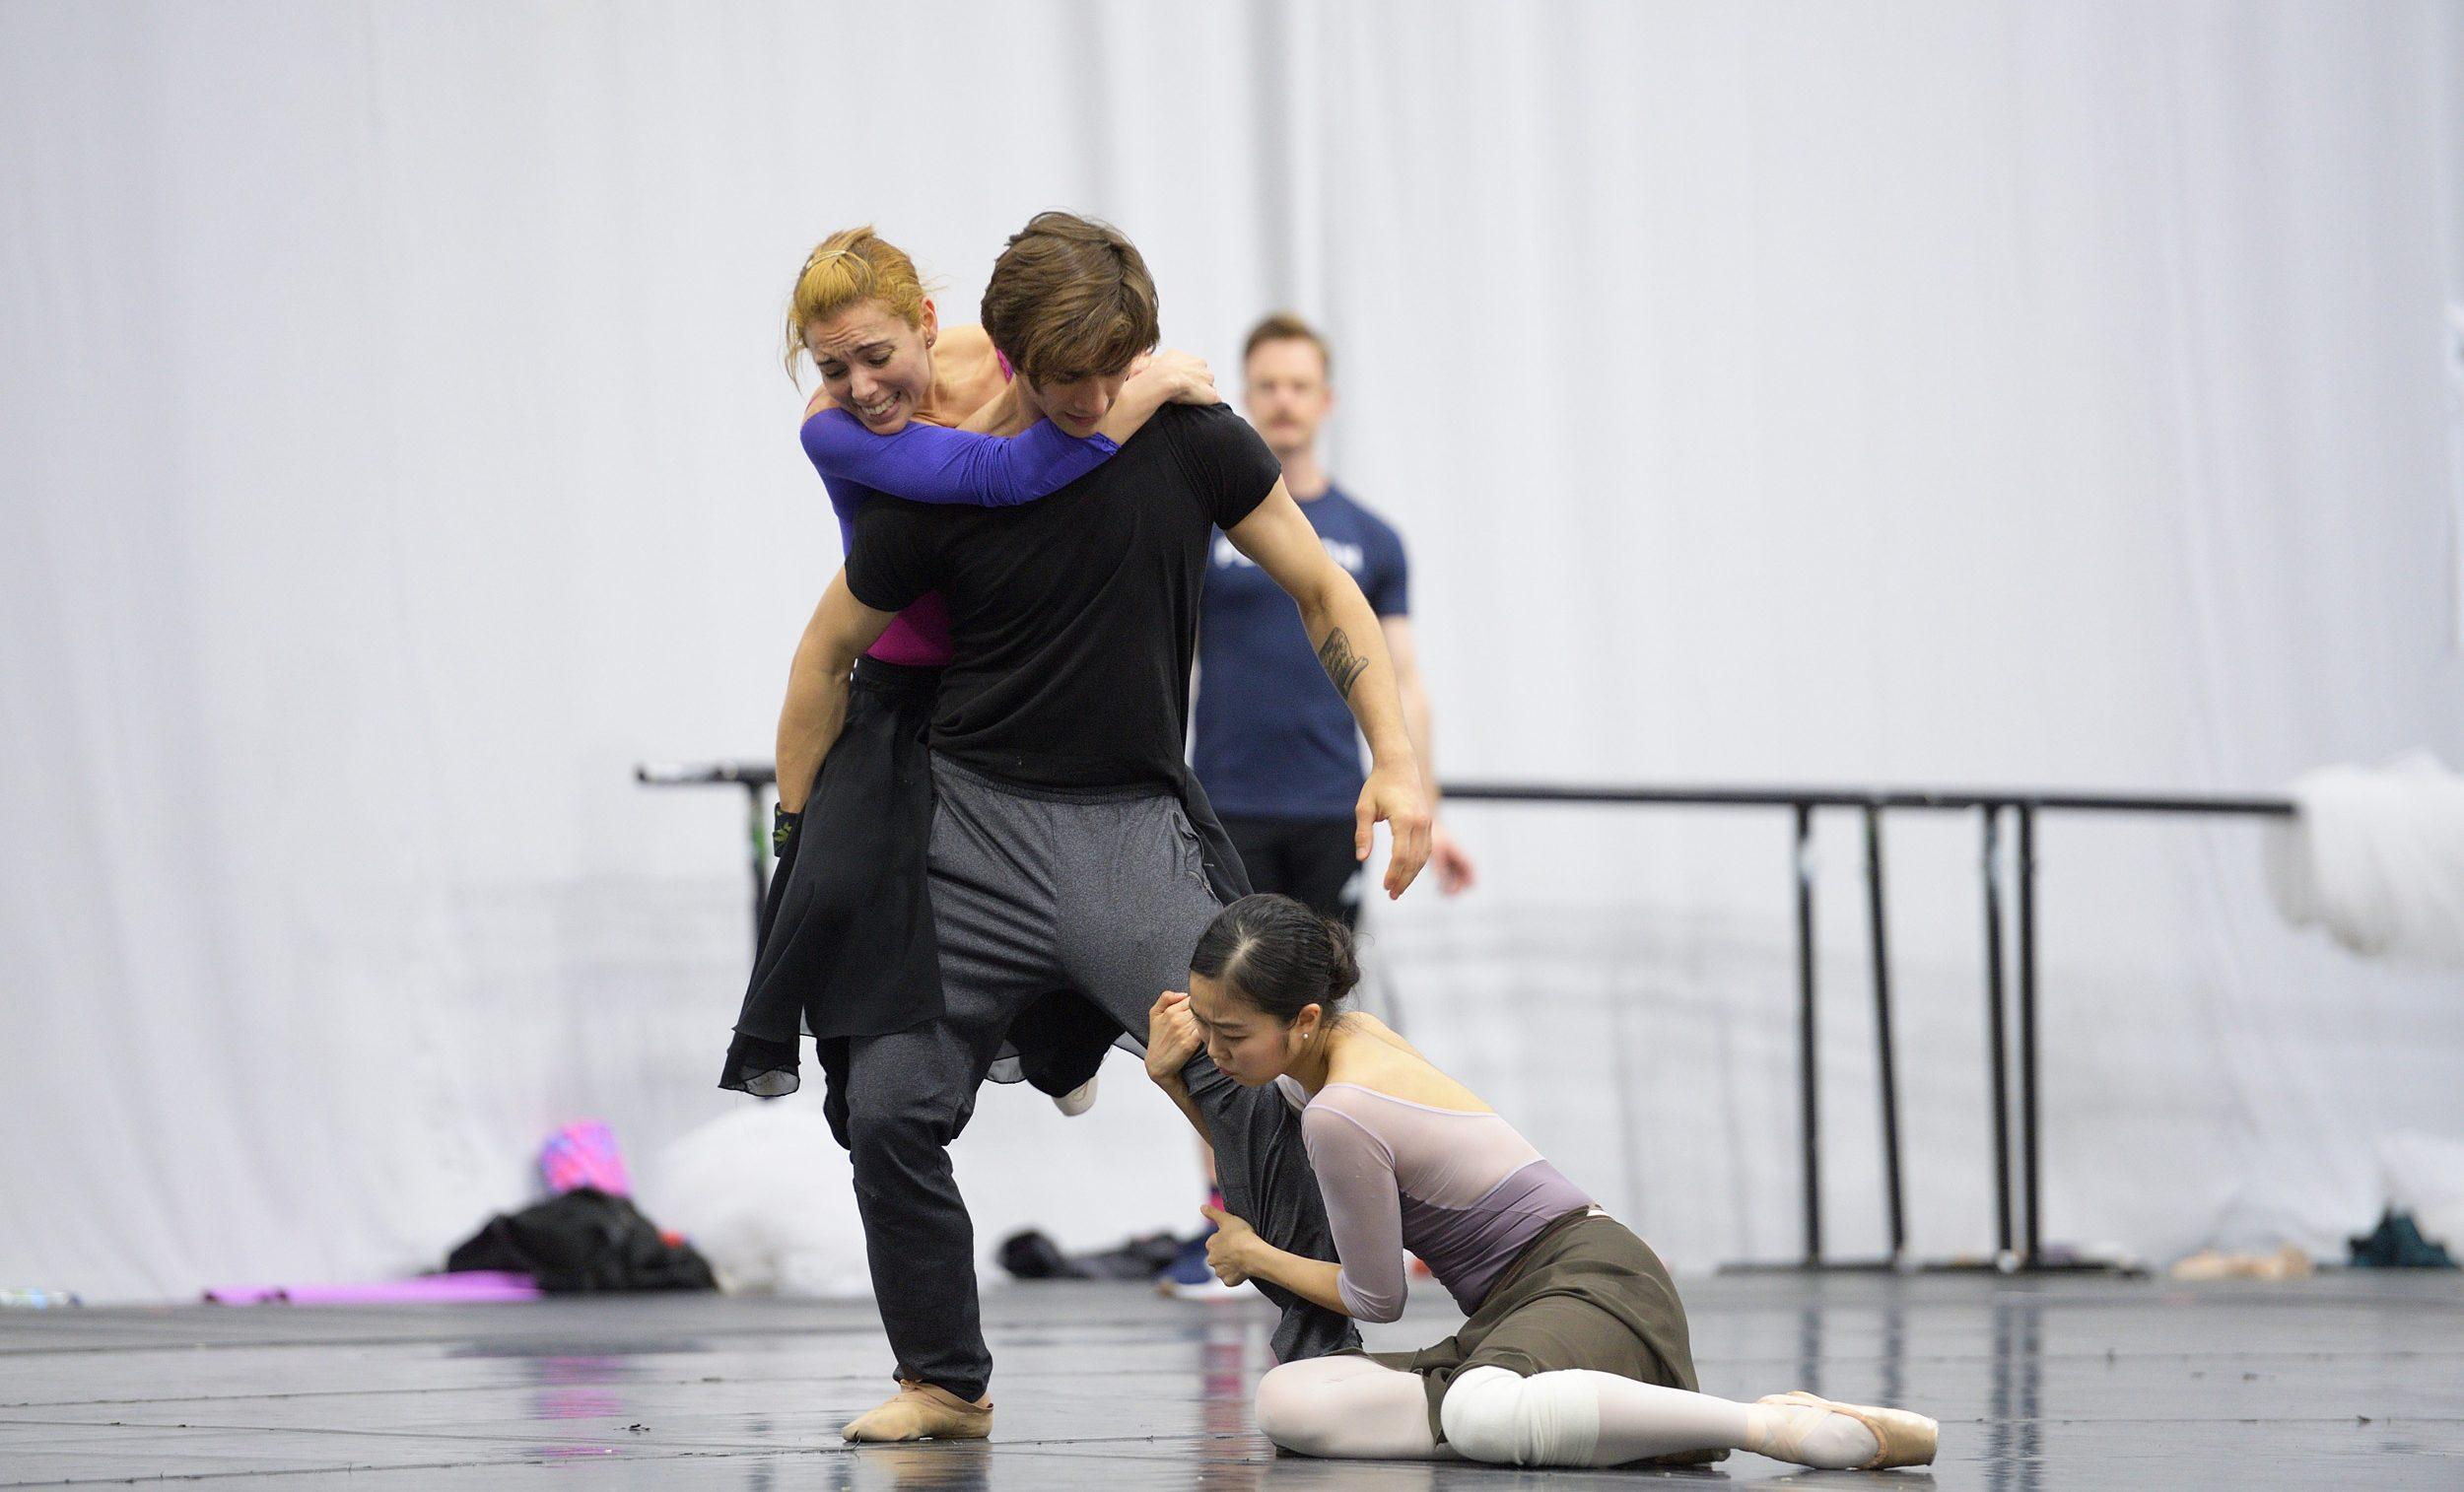 Fernanda Oliveira, Francesco Gabriele Frola, Shiori Kase rehearsing Christopher Wheeldon's Cinderella  © Laurent Liotardo